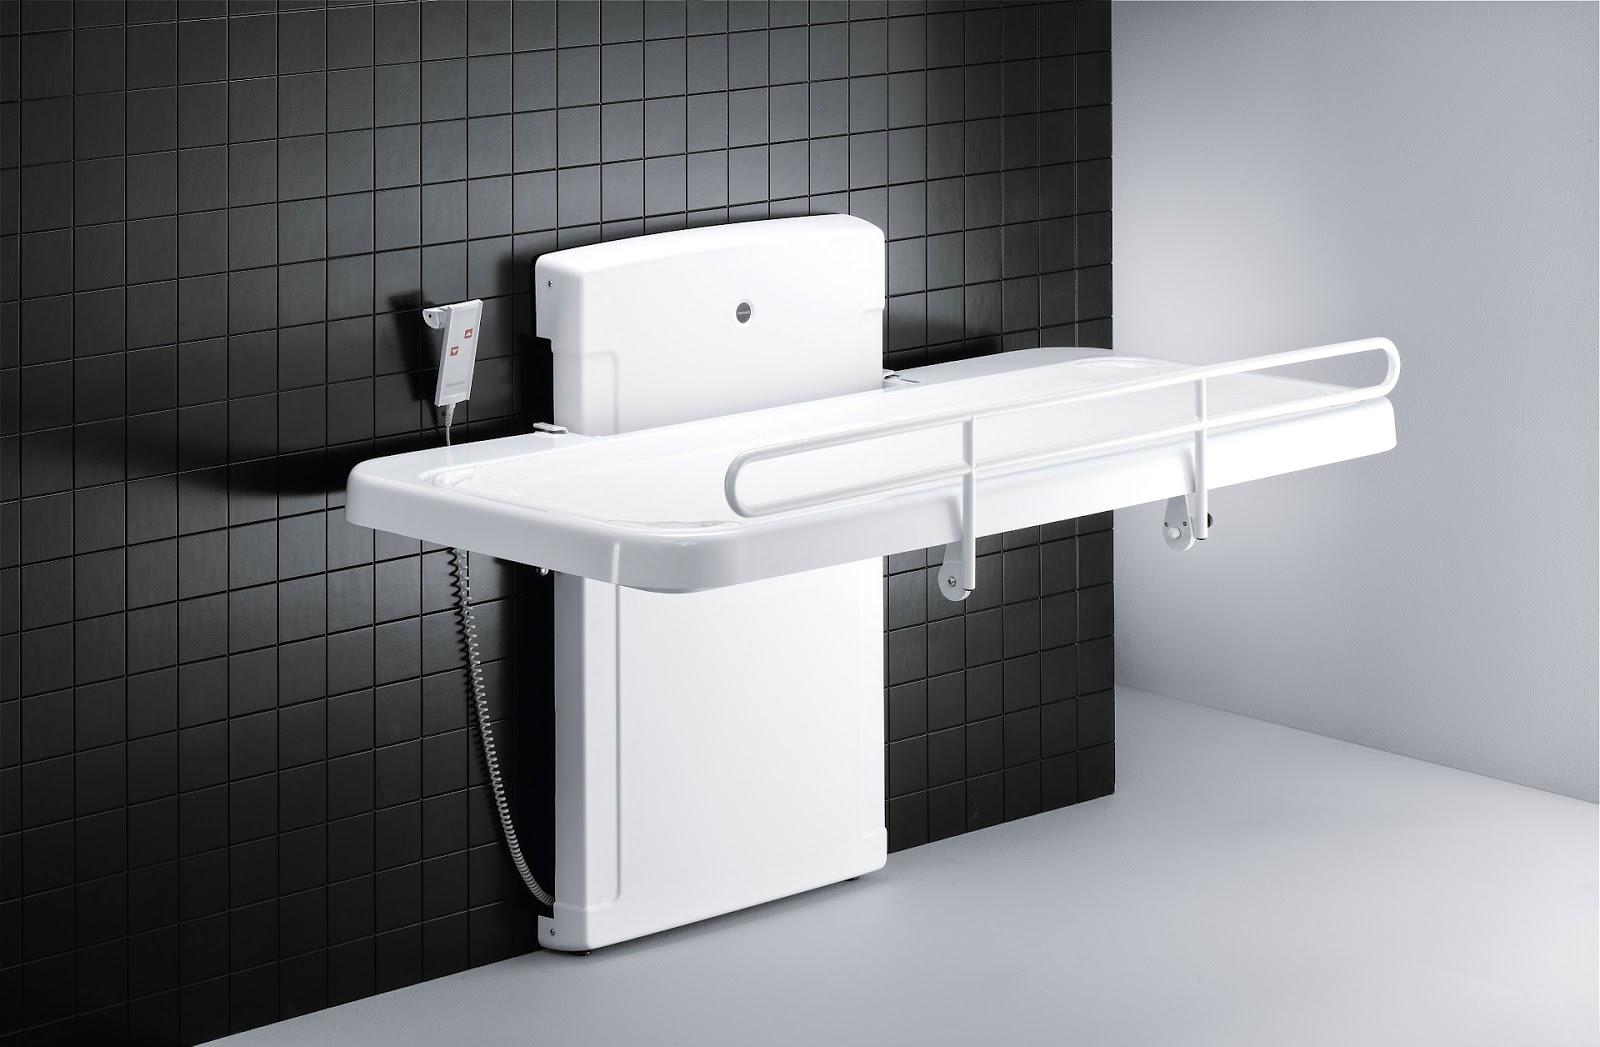 Pressalit R8478000 Powered Nursing Bench with Safety Rail